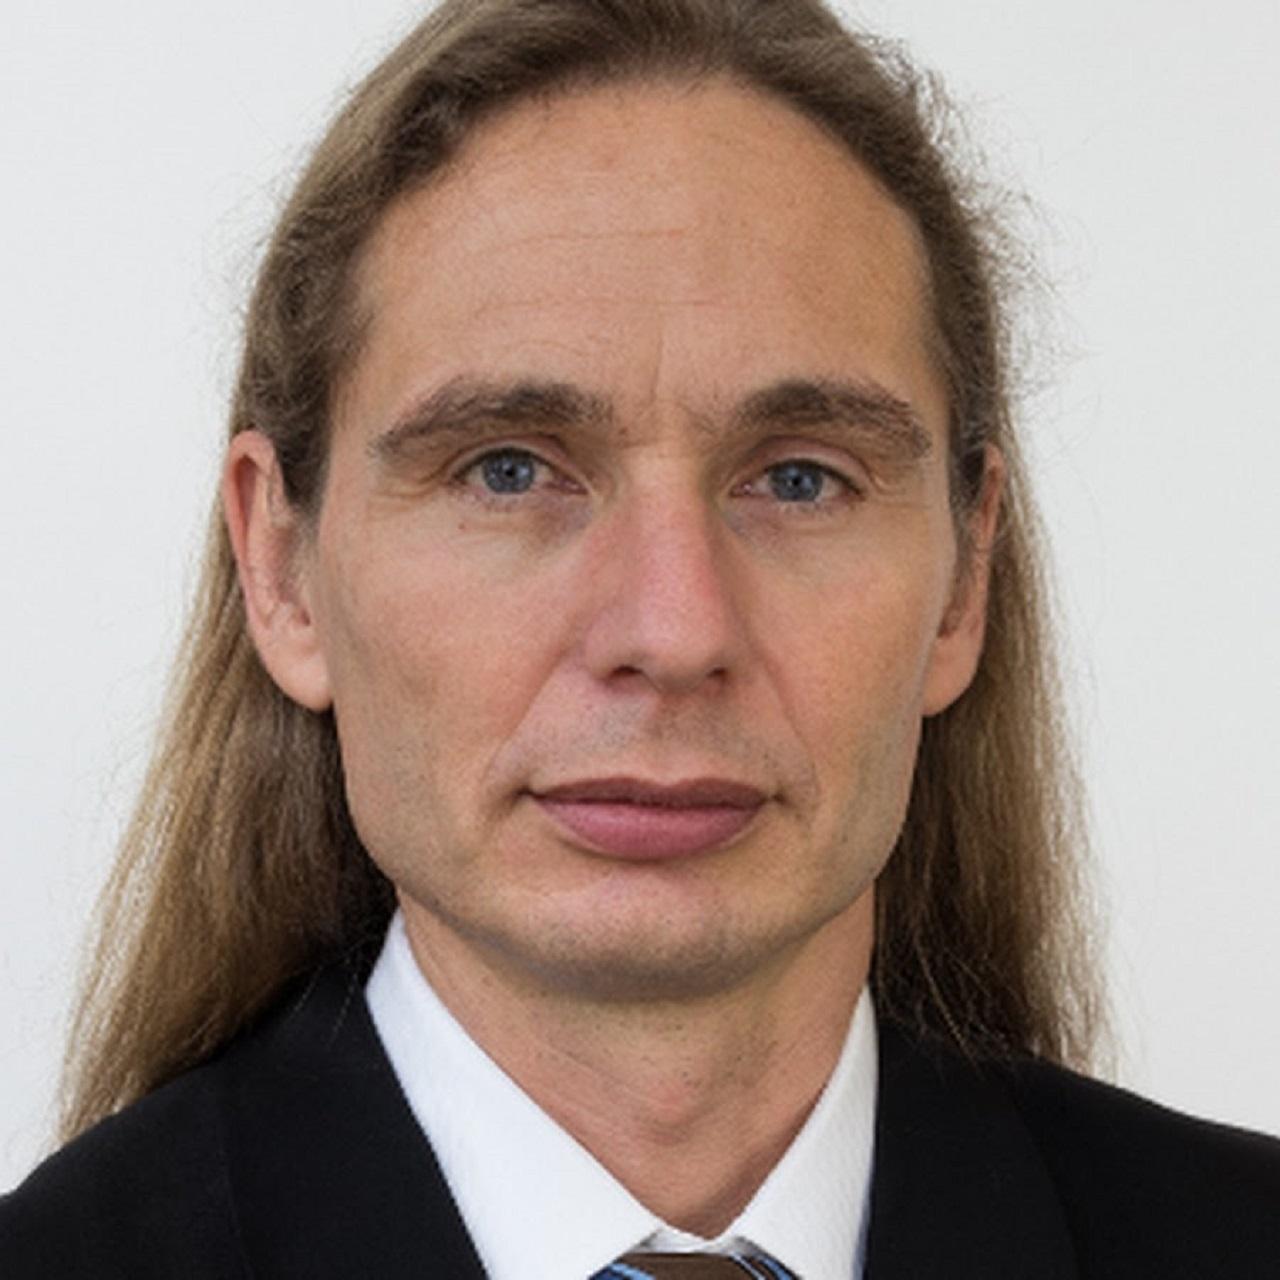 Christian Swertz